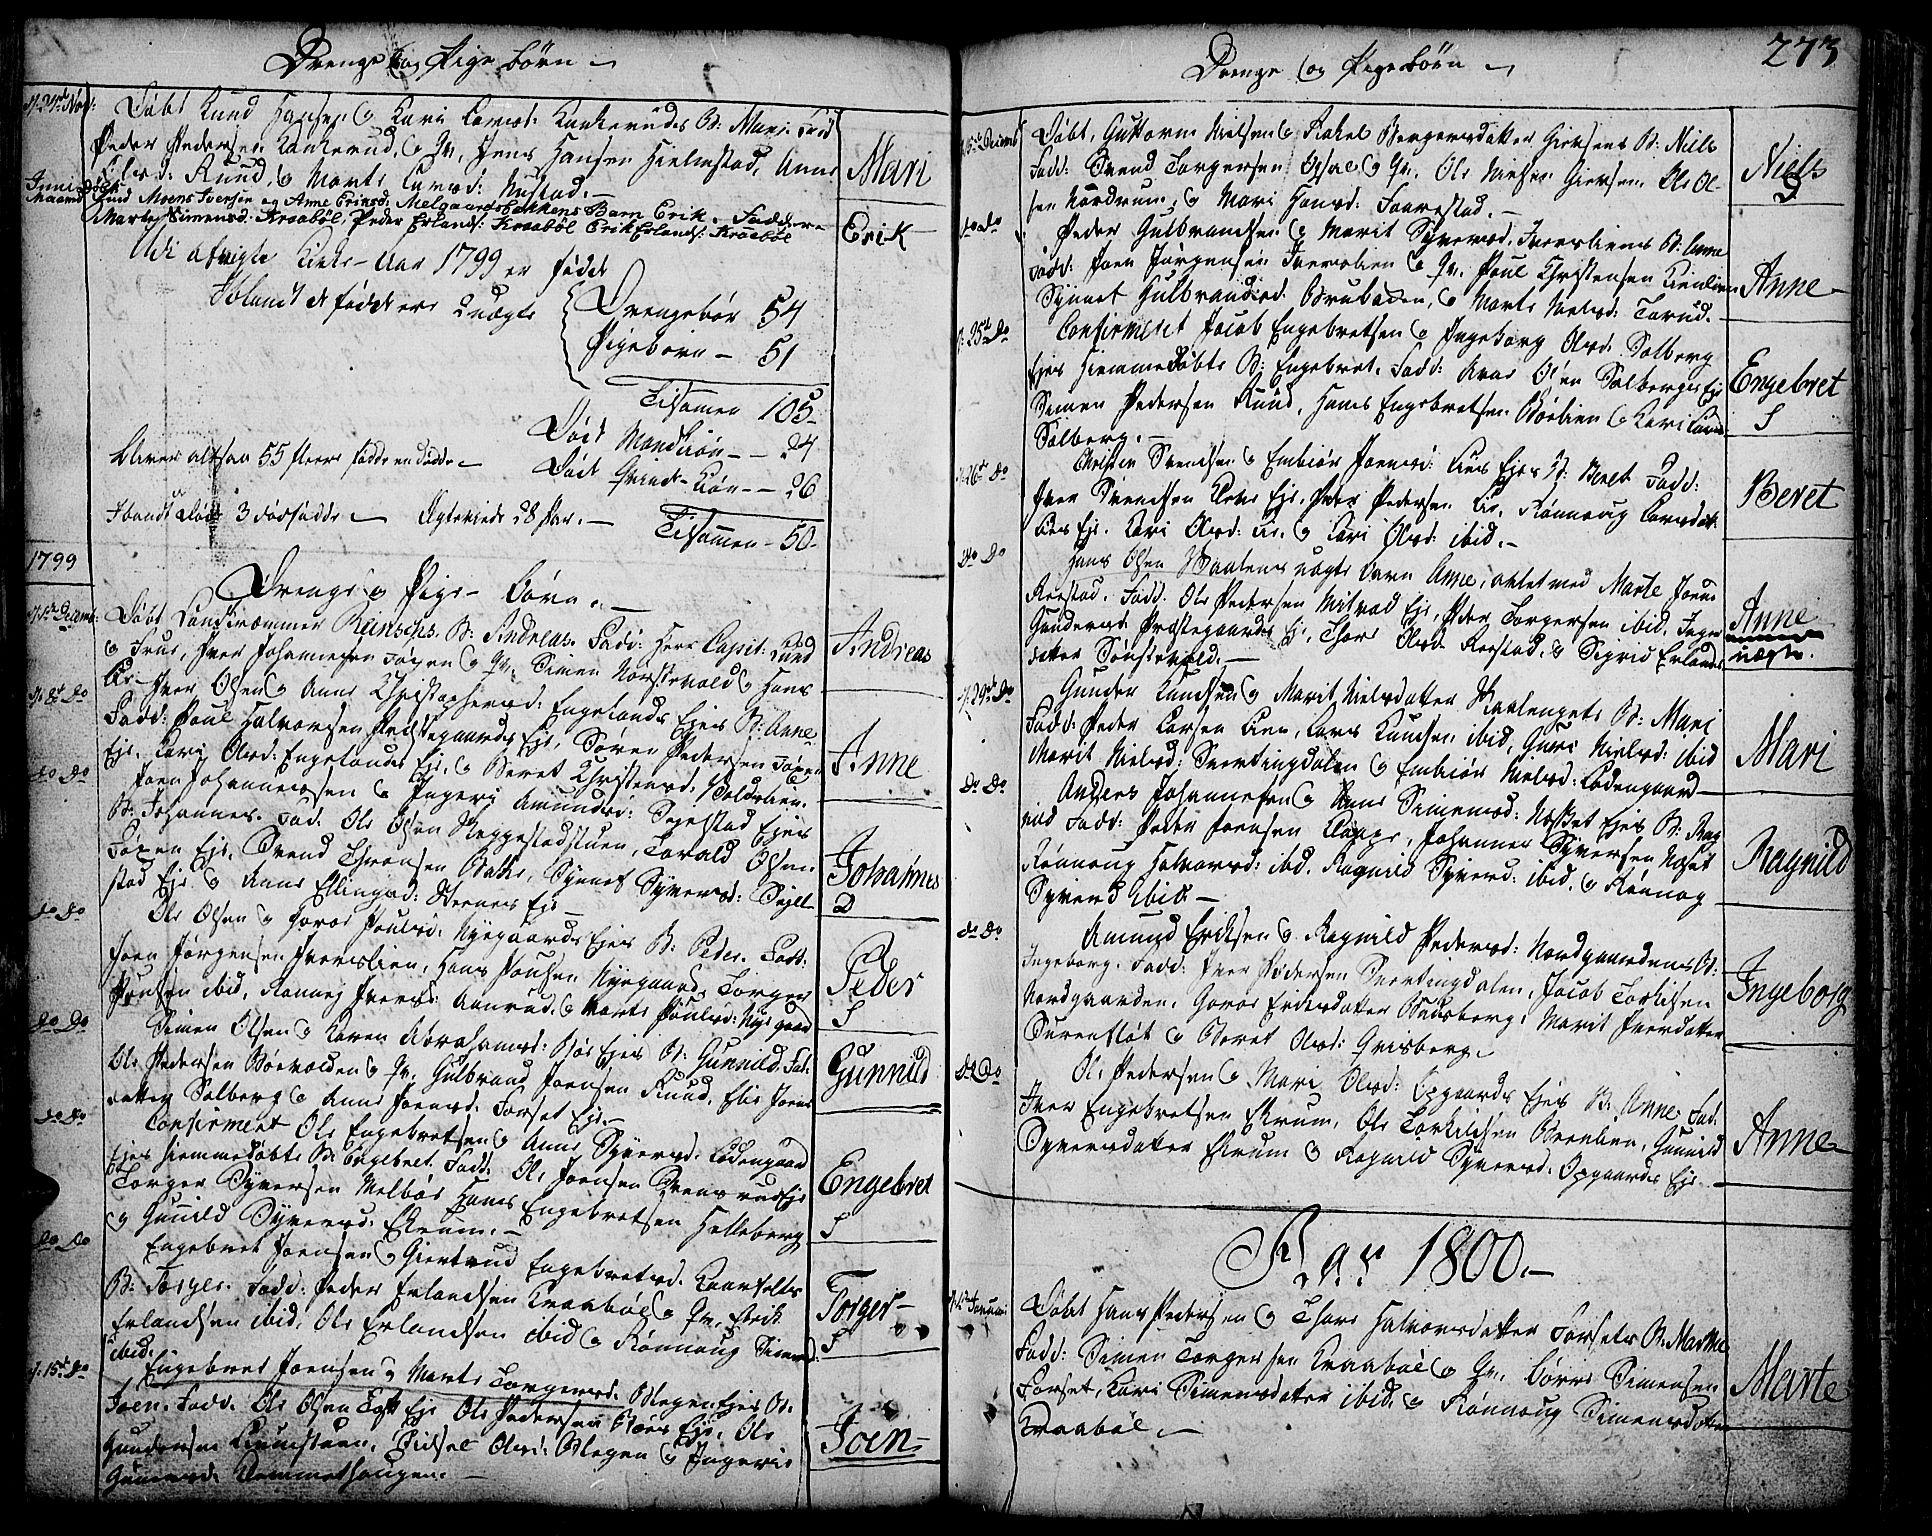 SAH, Gausdal prestekontor, Ministerialbok nr. 3, 1758-1809, s. 273